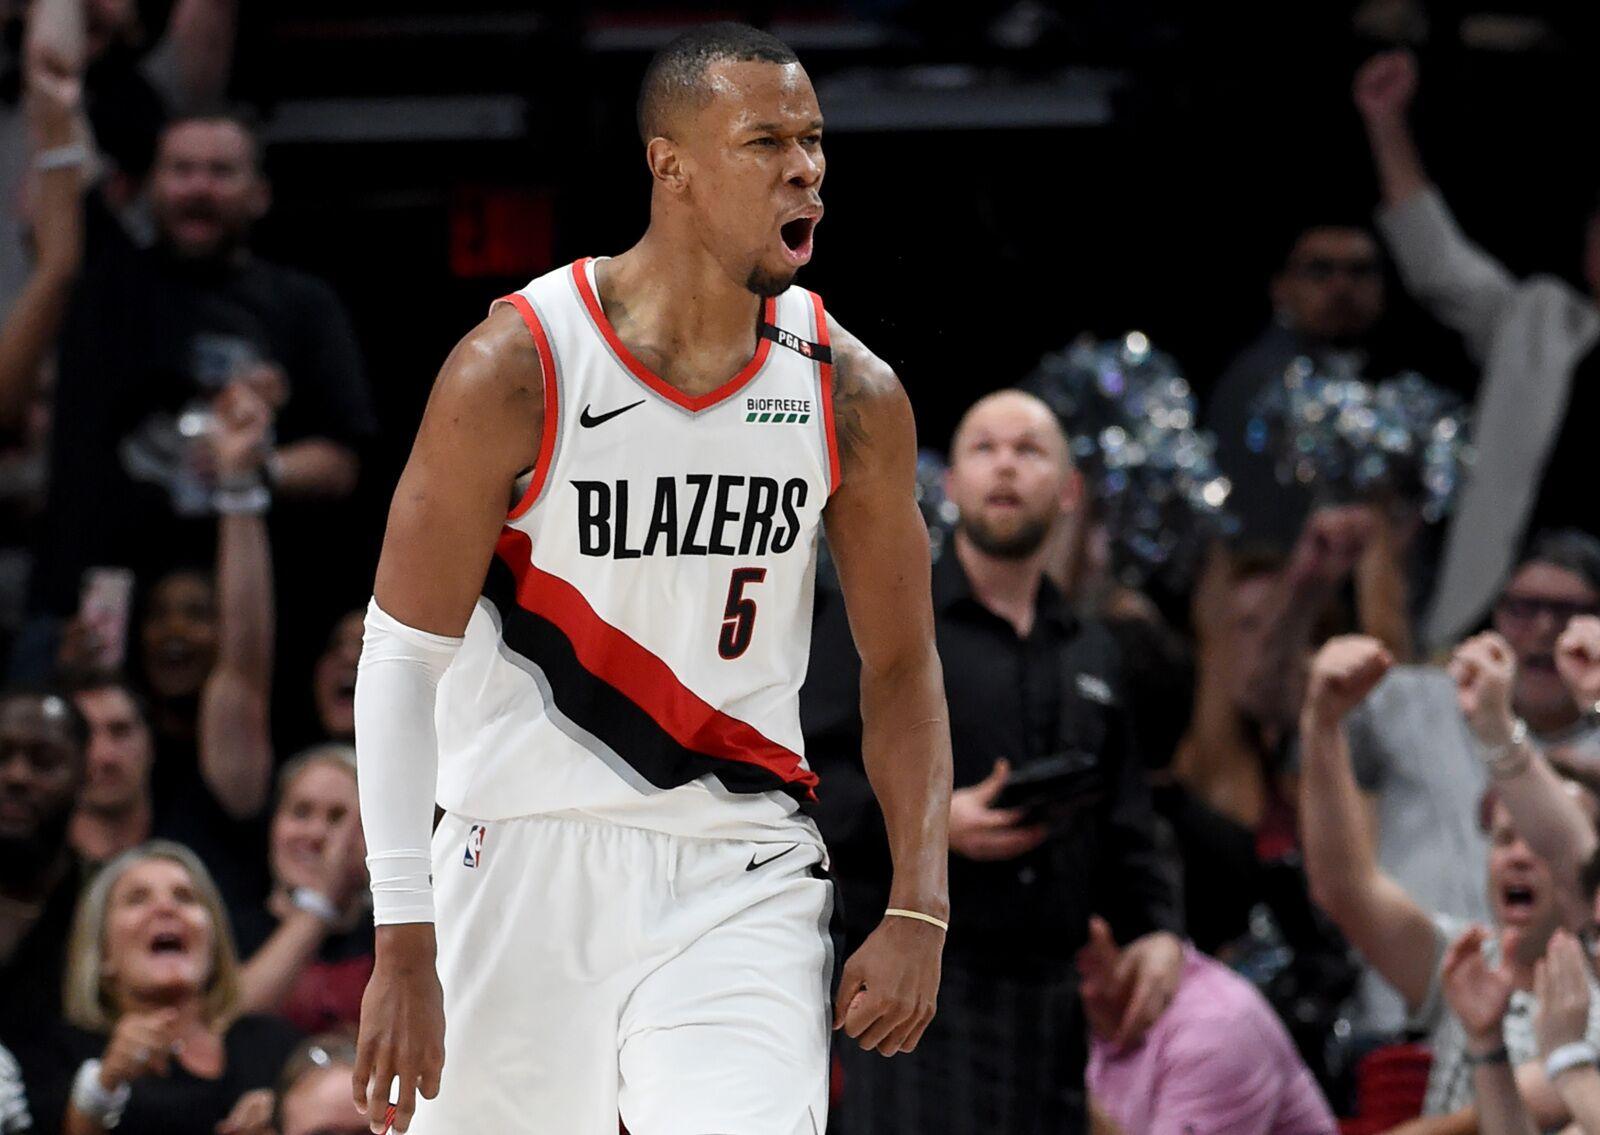 Rodney Hood makes his return to the Portland Trail Blazers